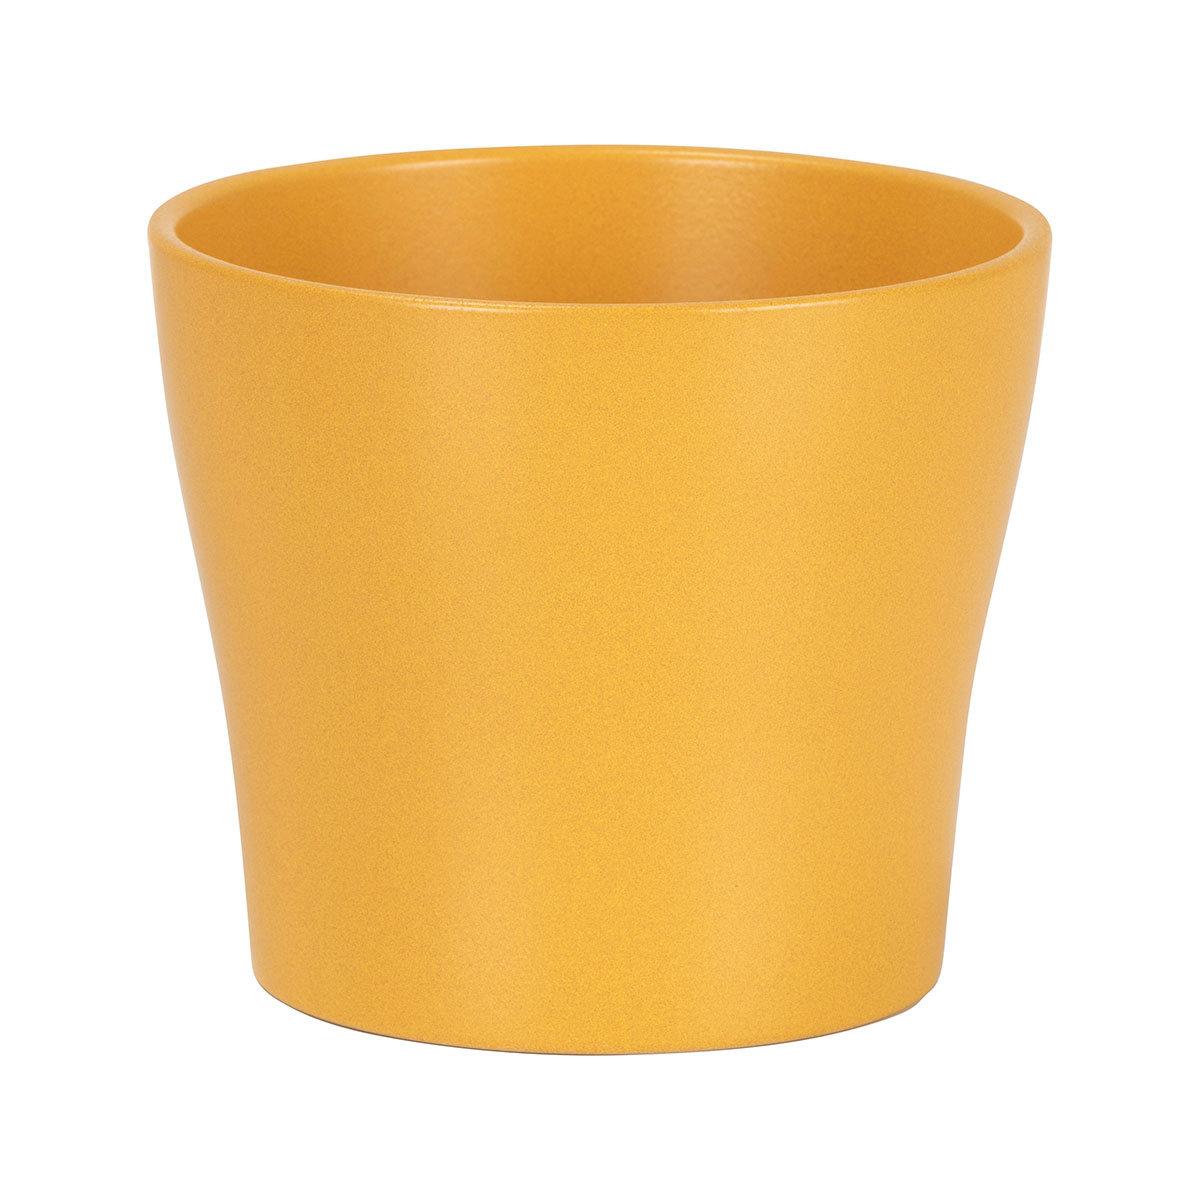 Übertopf Curcuma, 19 cm, Gelb